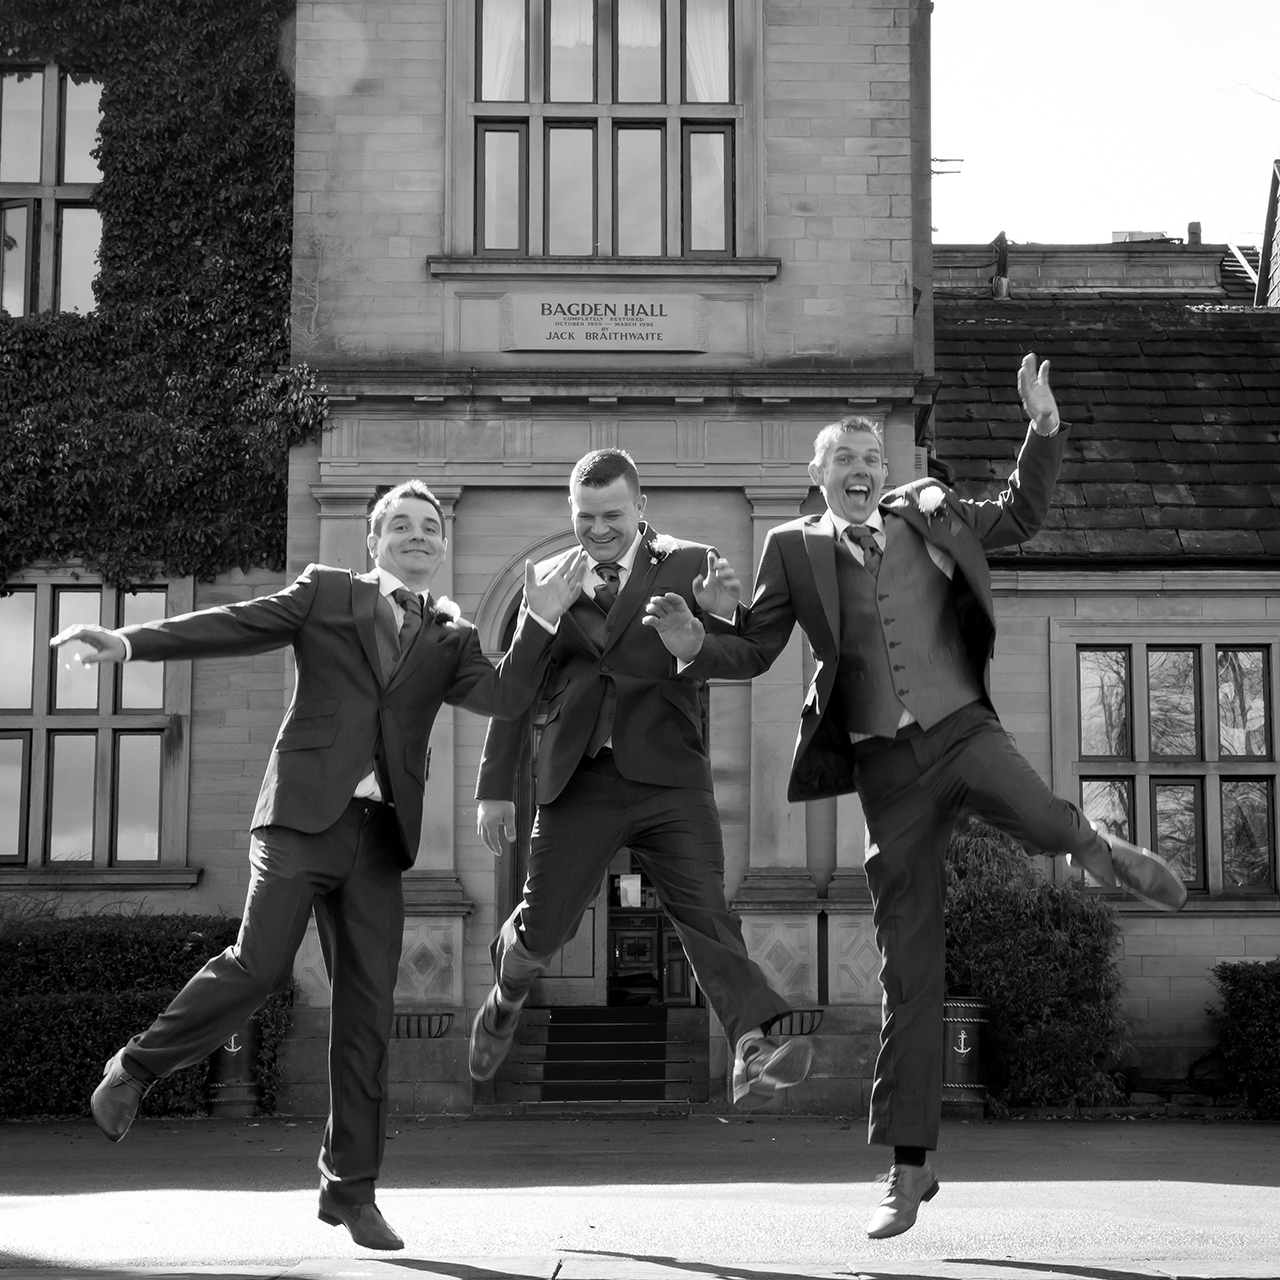 Traci Habergham Photography Bagden Hall Wedding Groom & Best Men